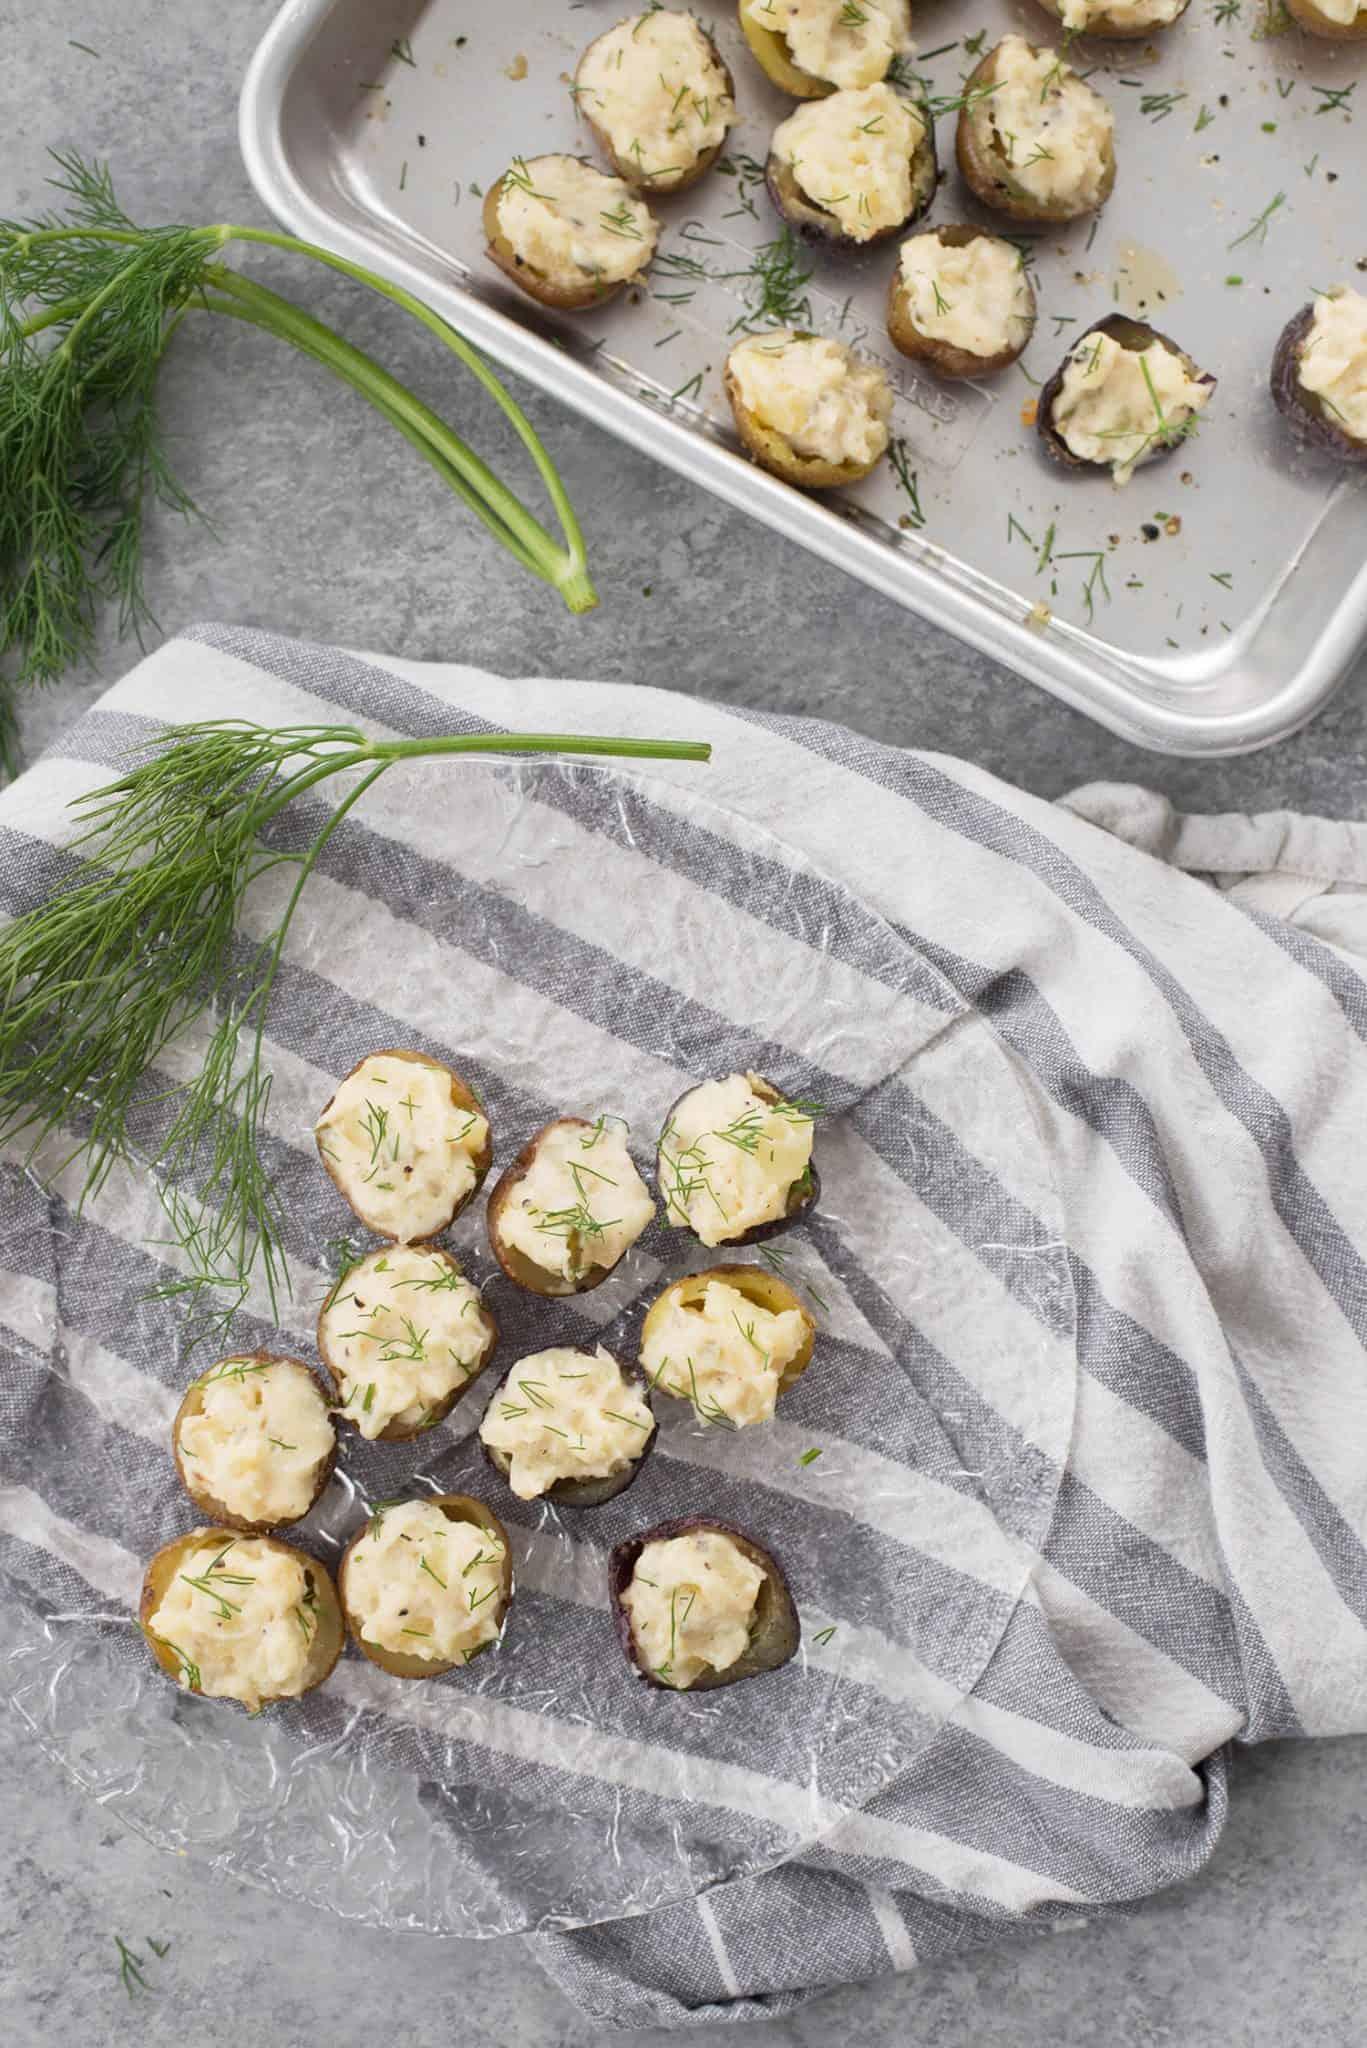 Deviled Potatoes! These mini potatoes are the perfect Spring appetizer. Crispy potato shells stuffed with deviled dill potato filling. Vegan and Gluten-Free. | www.delishknowledge.com